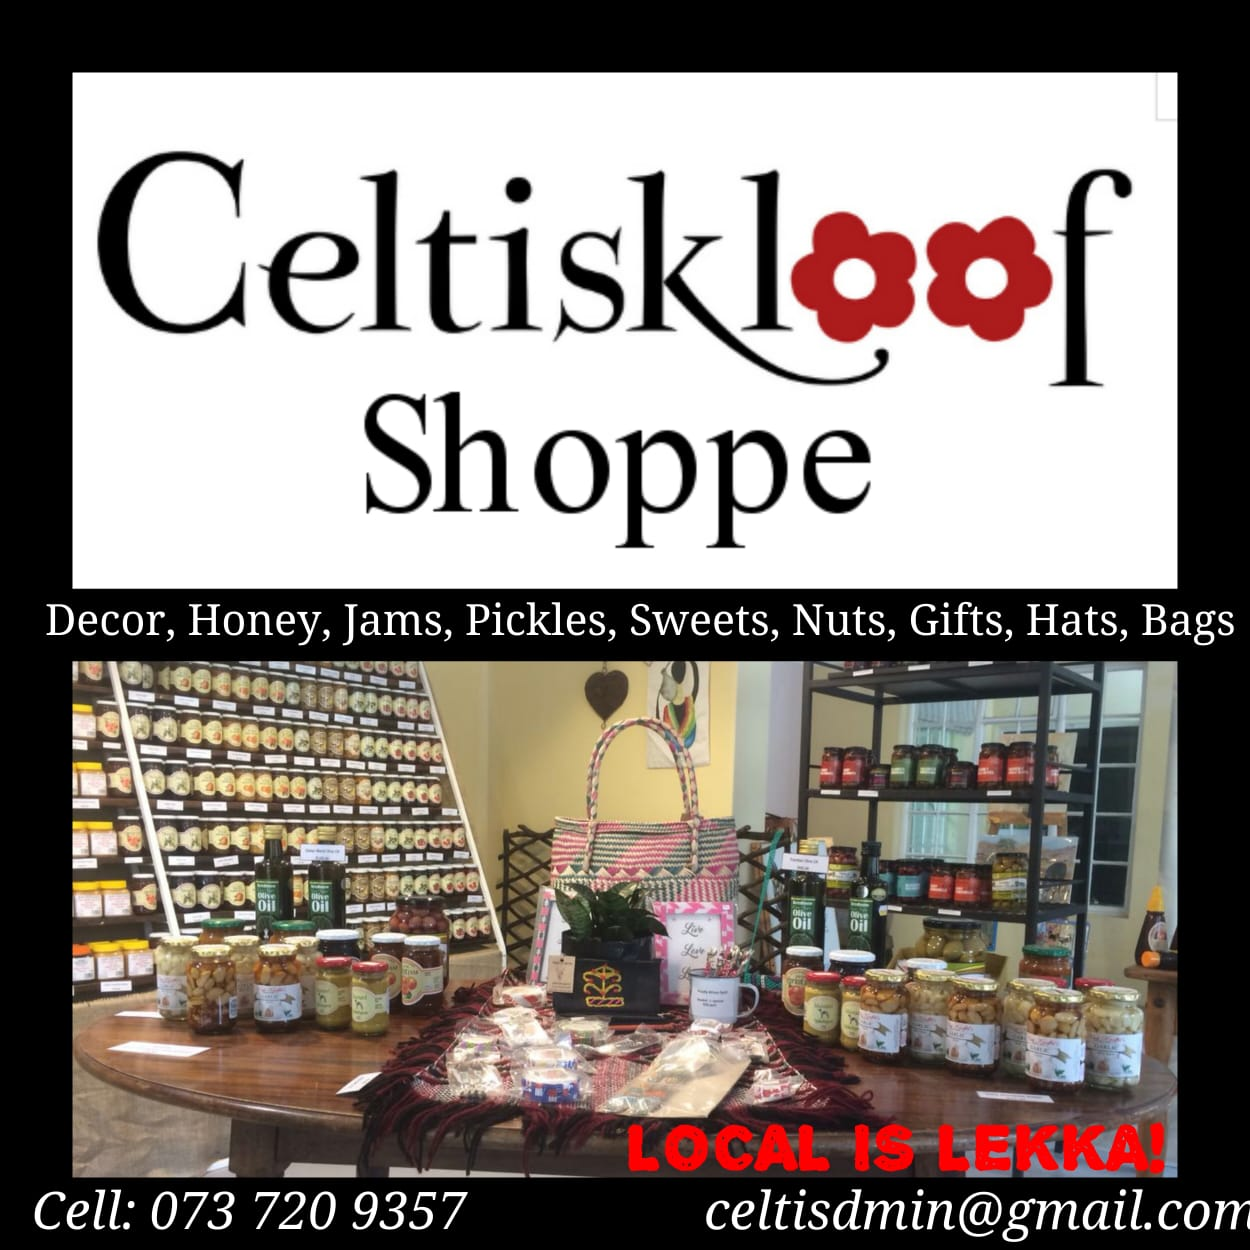 Celtiskloof Shoppe